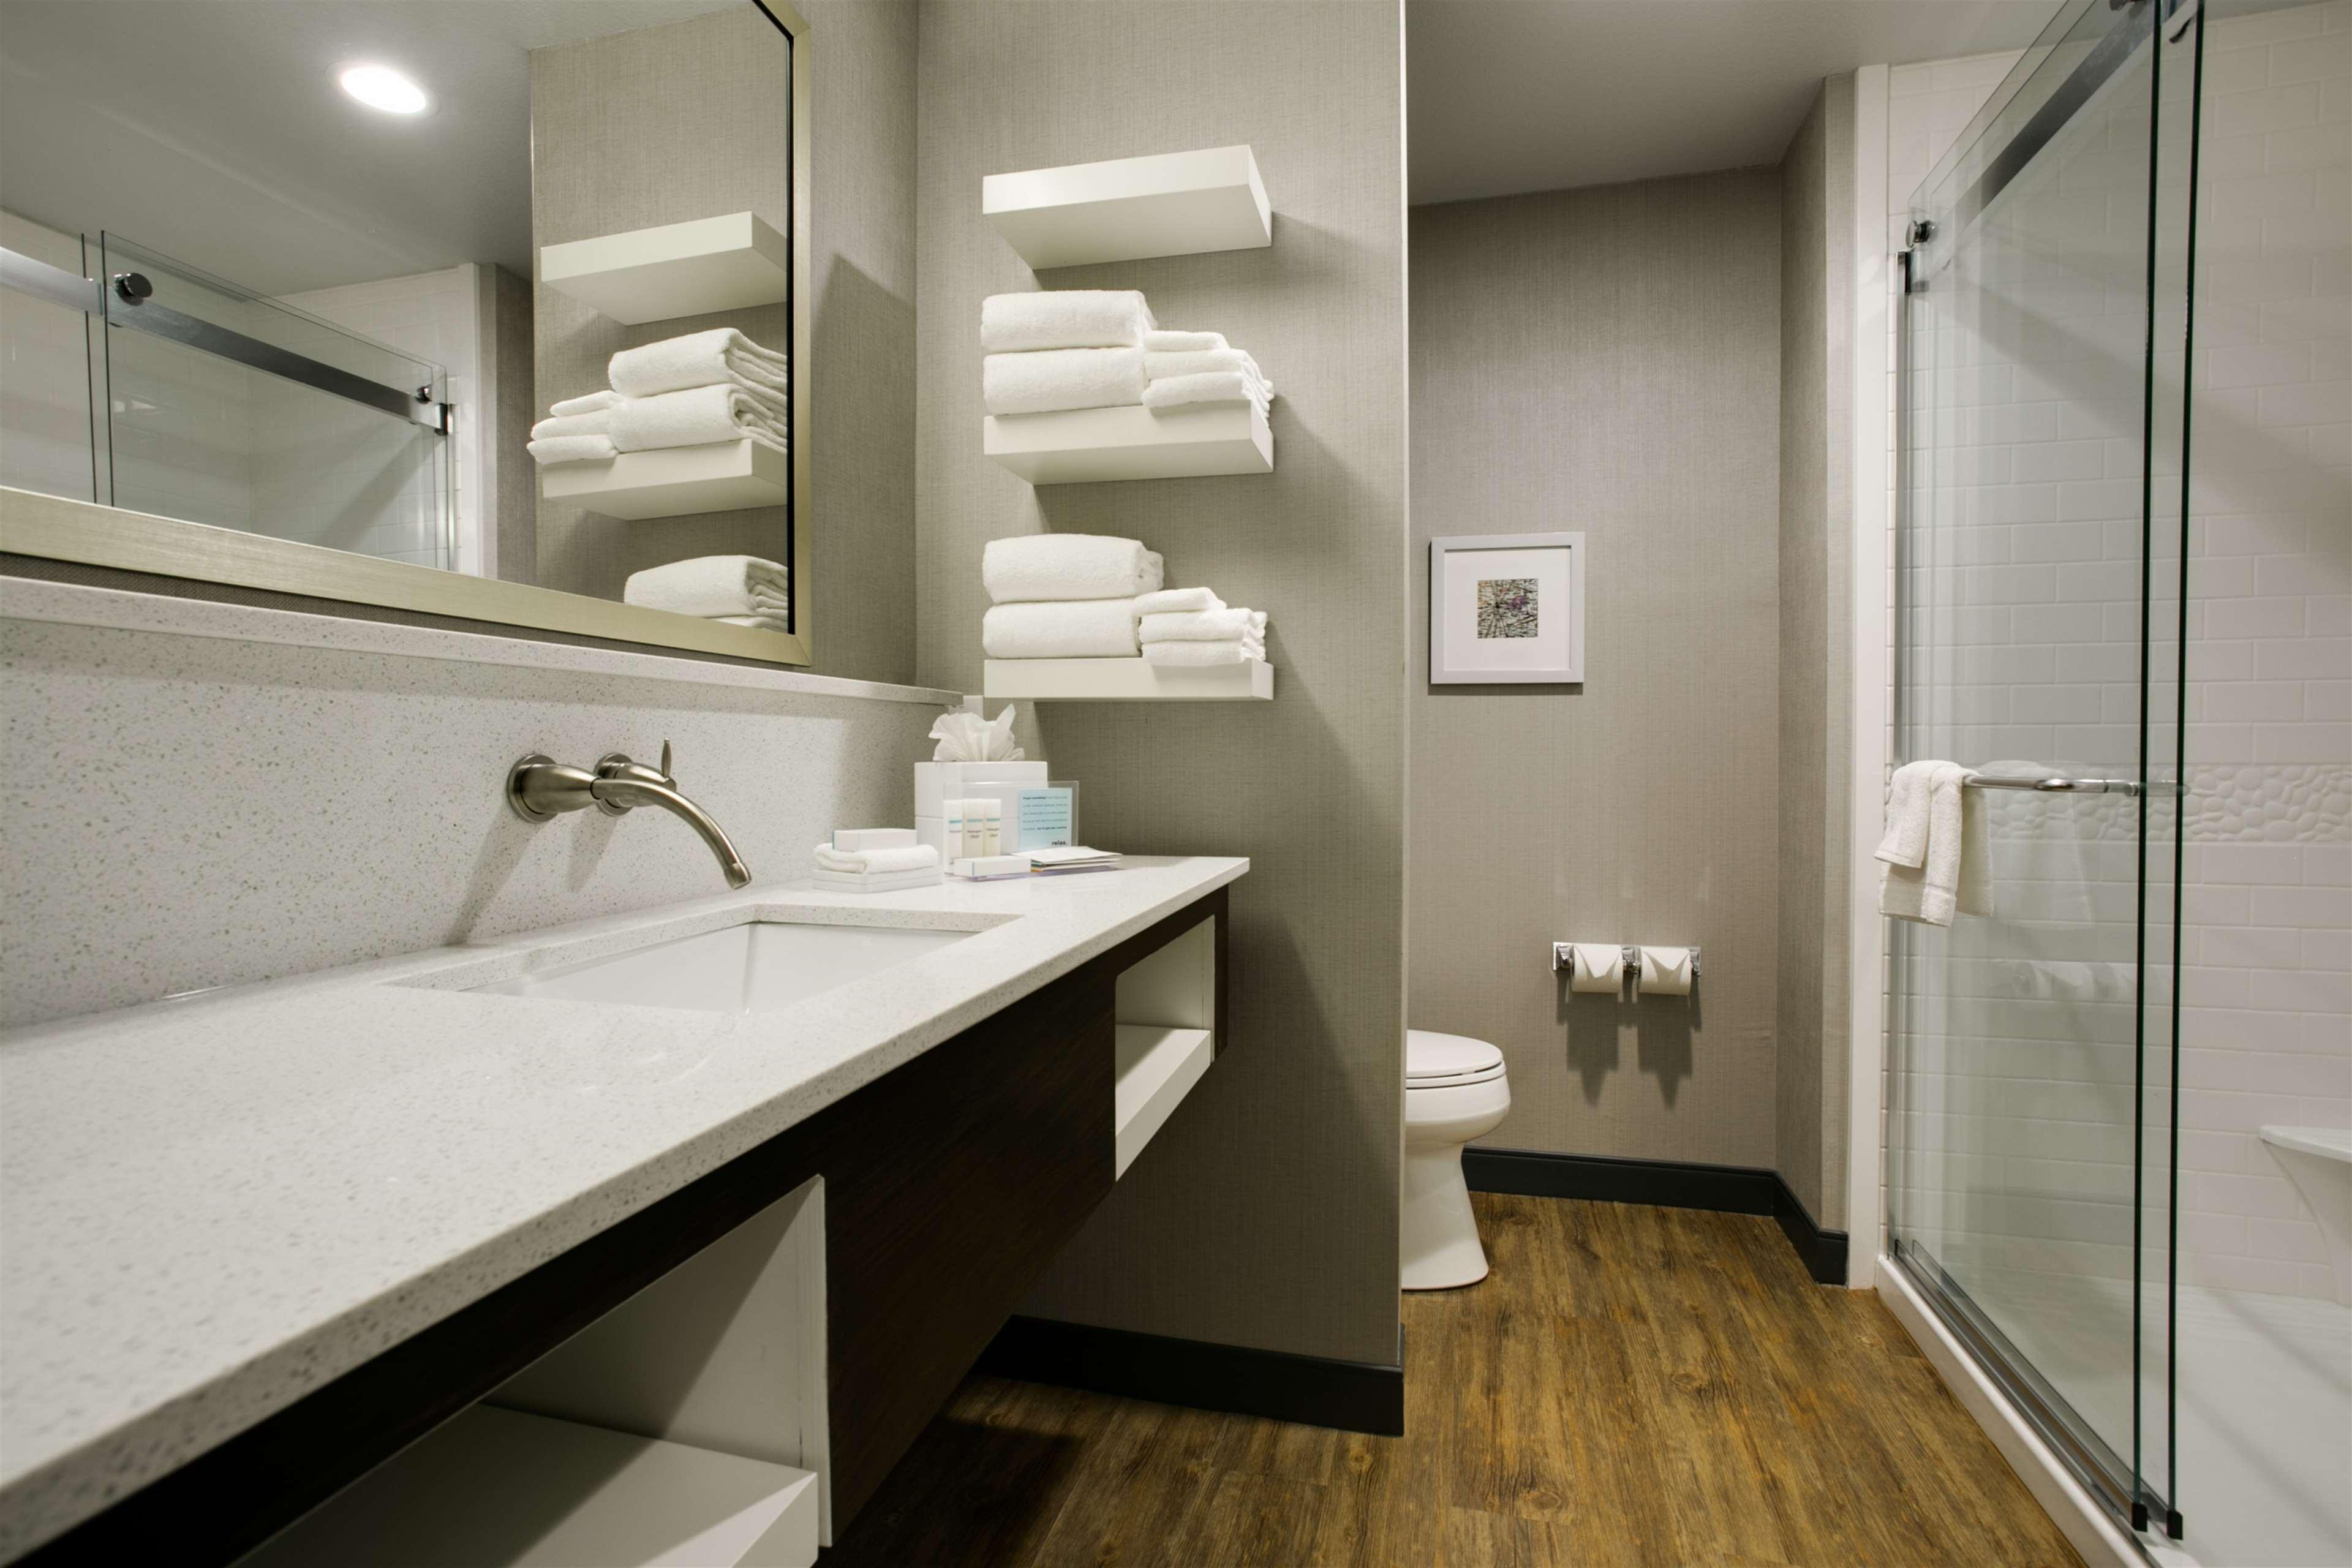 Hampton Inn & Suites Dallas/Ft. Worth Airport South image 28